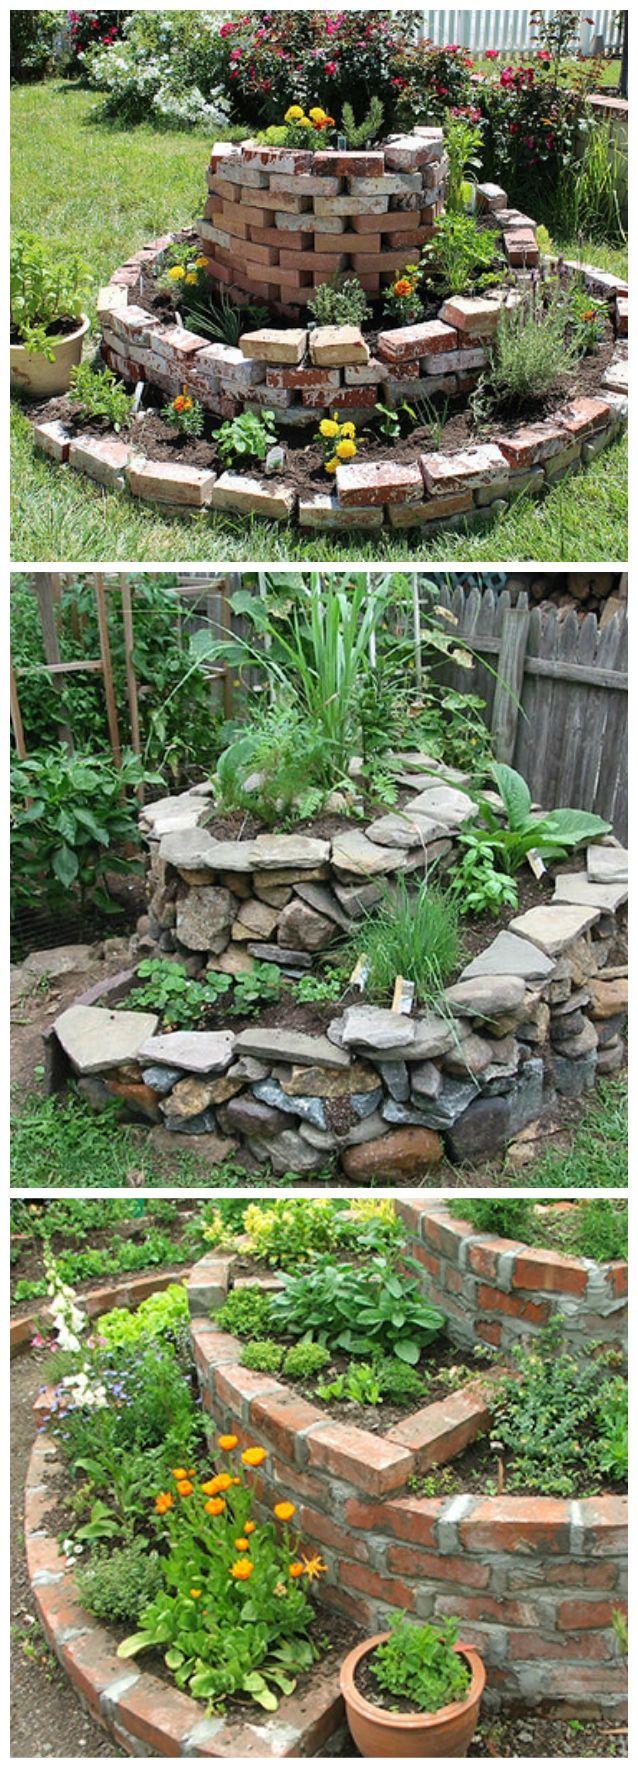 How to build a herb spiral garden design pinterest for Herb garden ideas designs